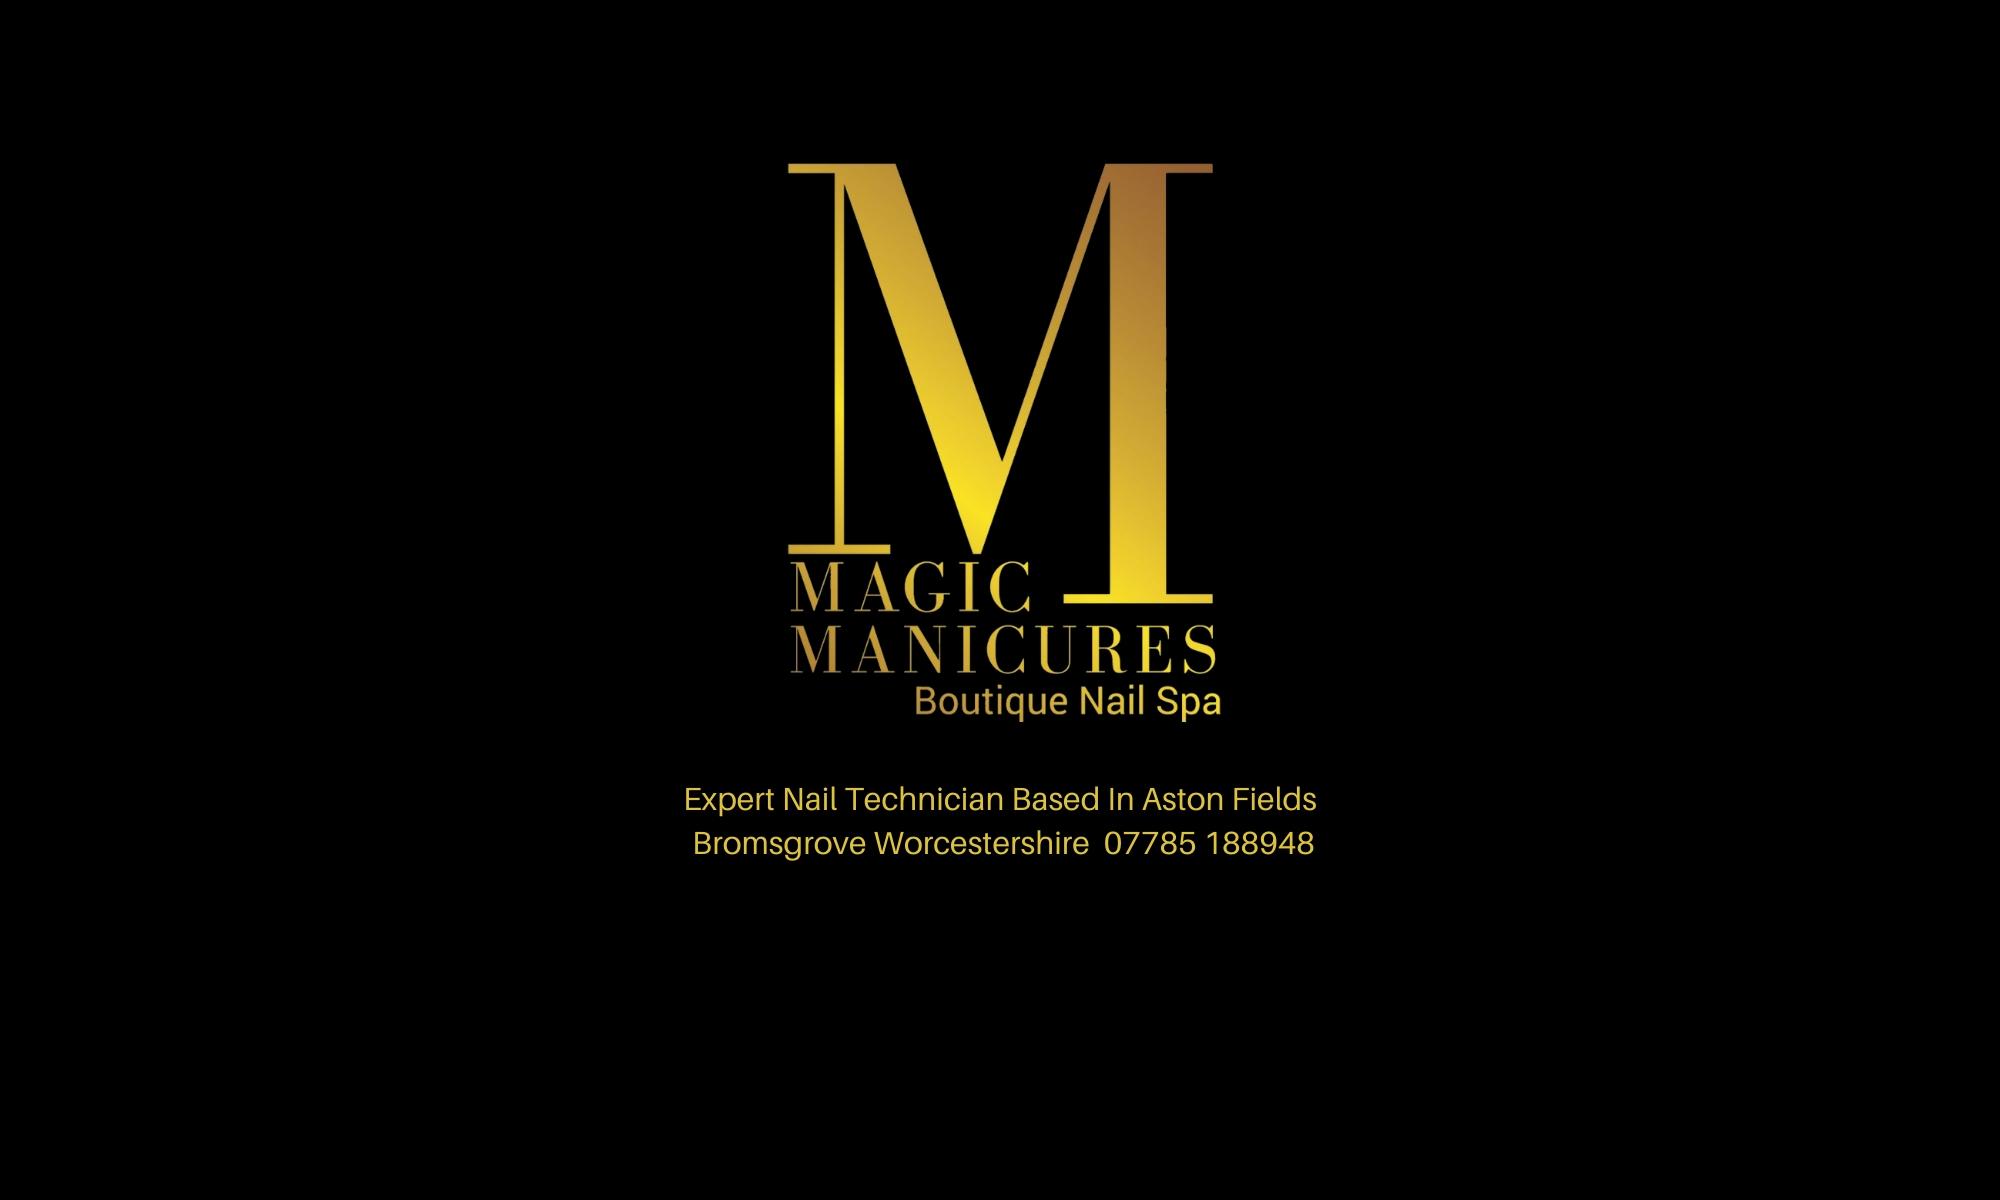 Magic Manicures Boutique Nail Spa